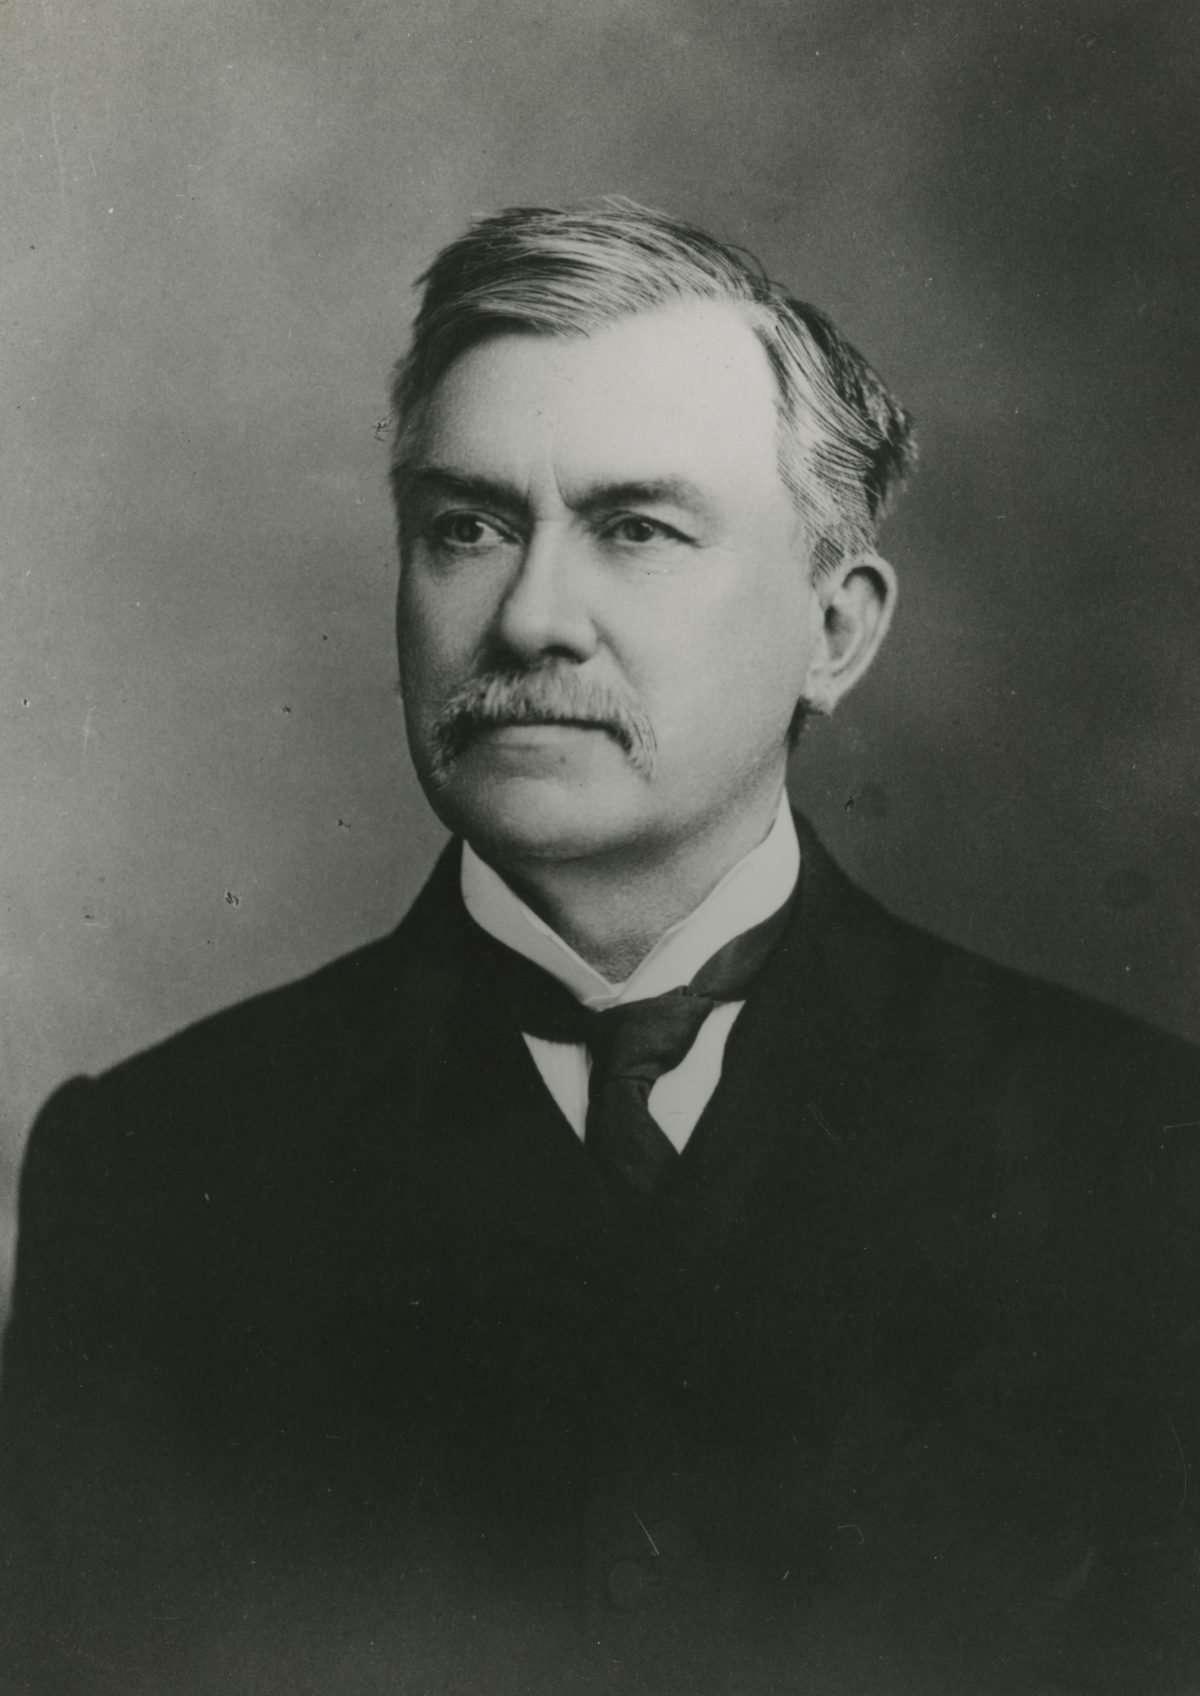 William Alexander Anderson